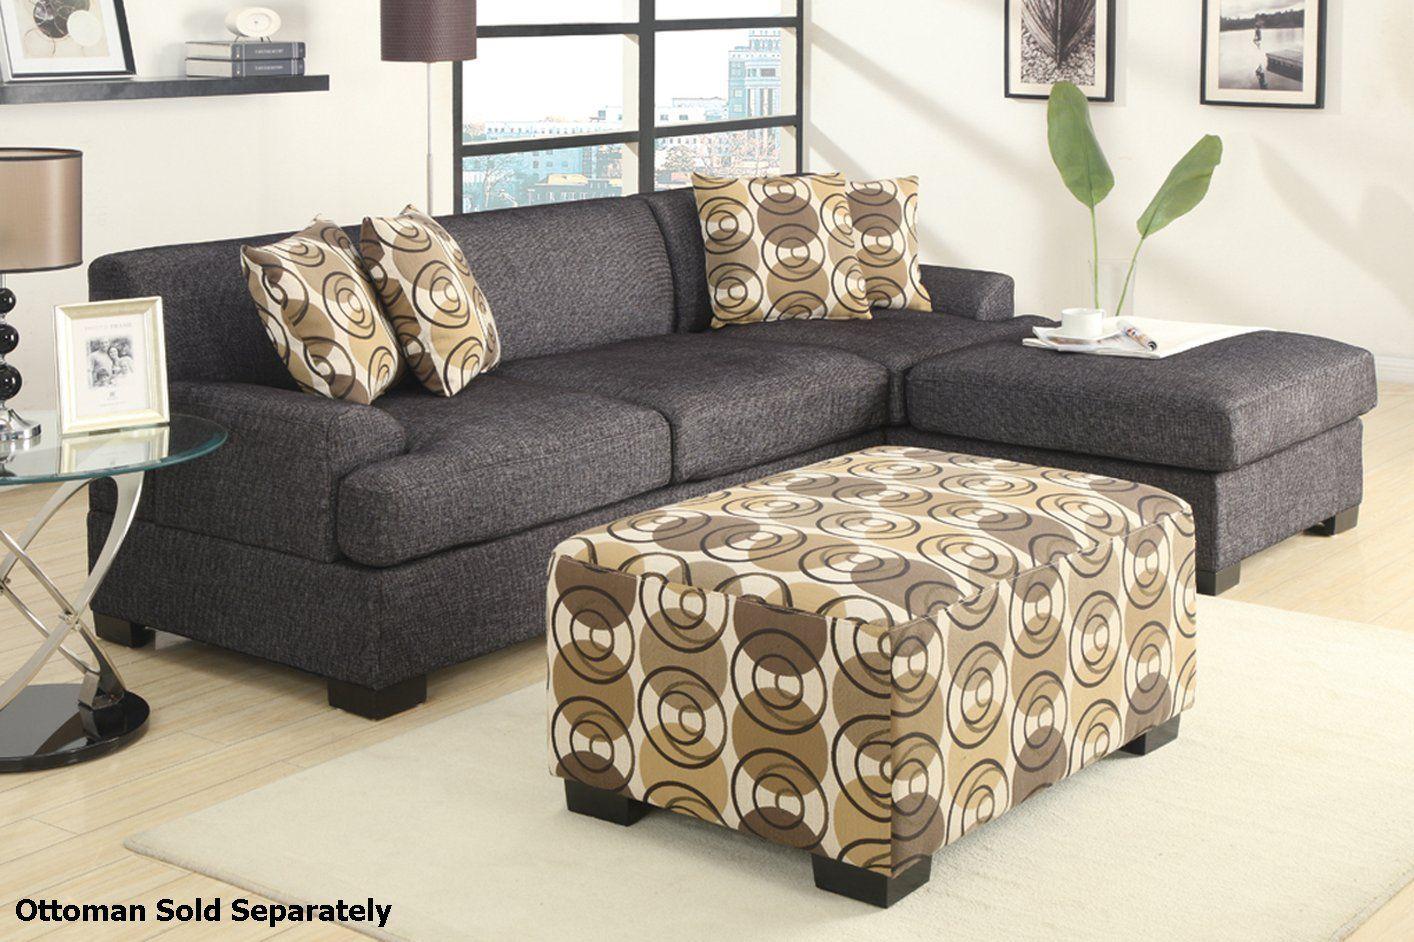 Prime Montreal Ii Grey Fabric Sectional Sofa Home Ideas In 2019 Evergreenethics Interior Chair Design Evergreenethicsorg